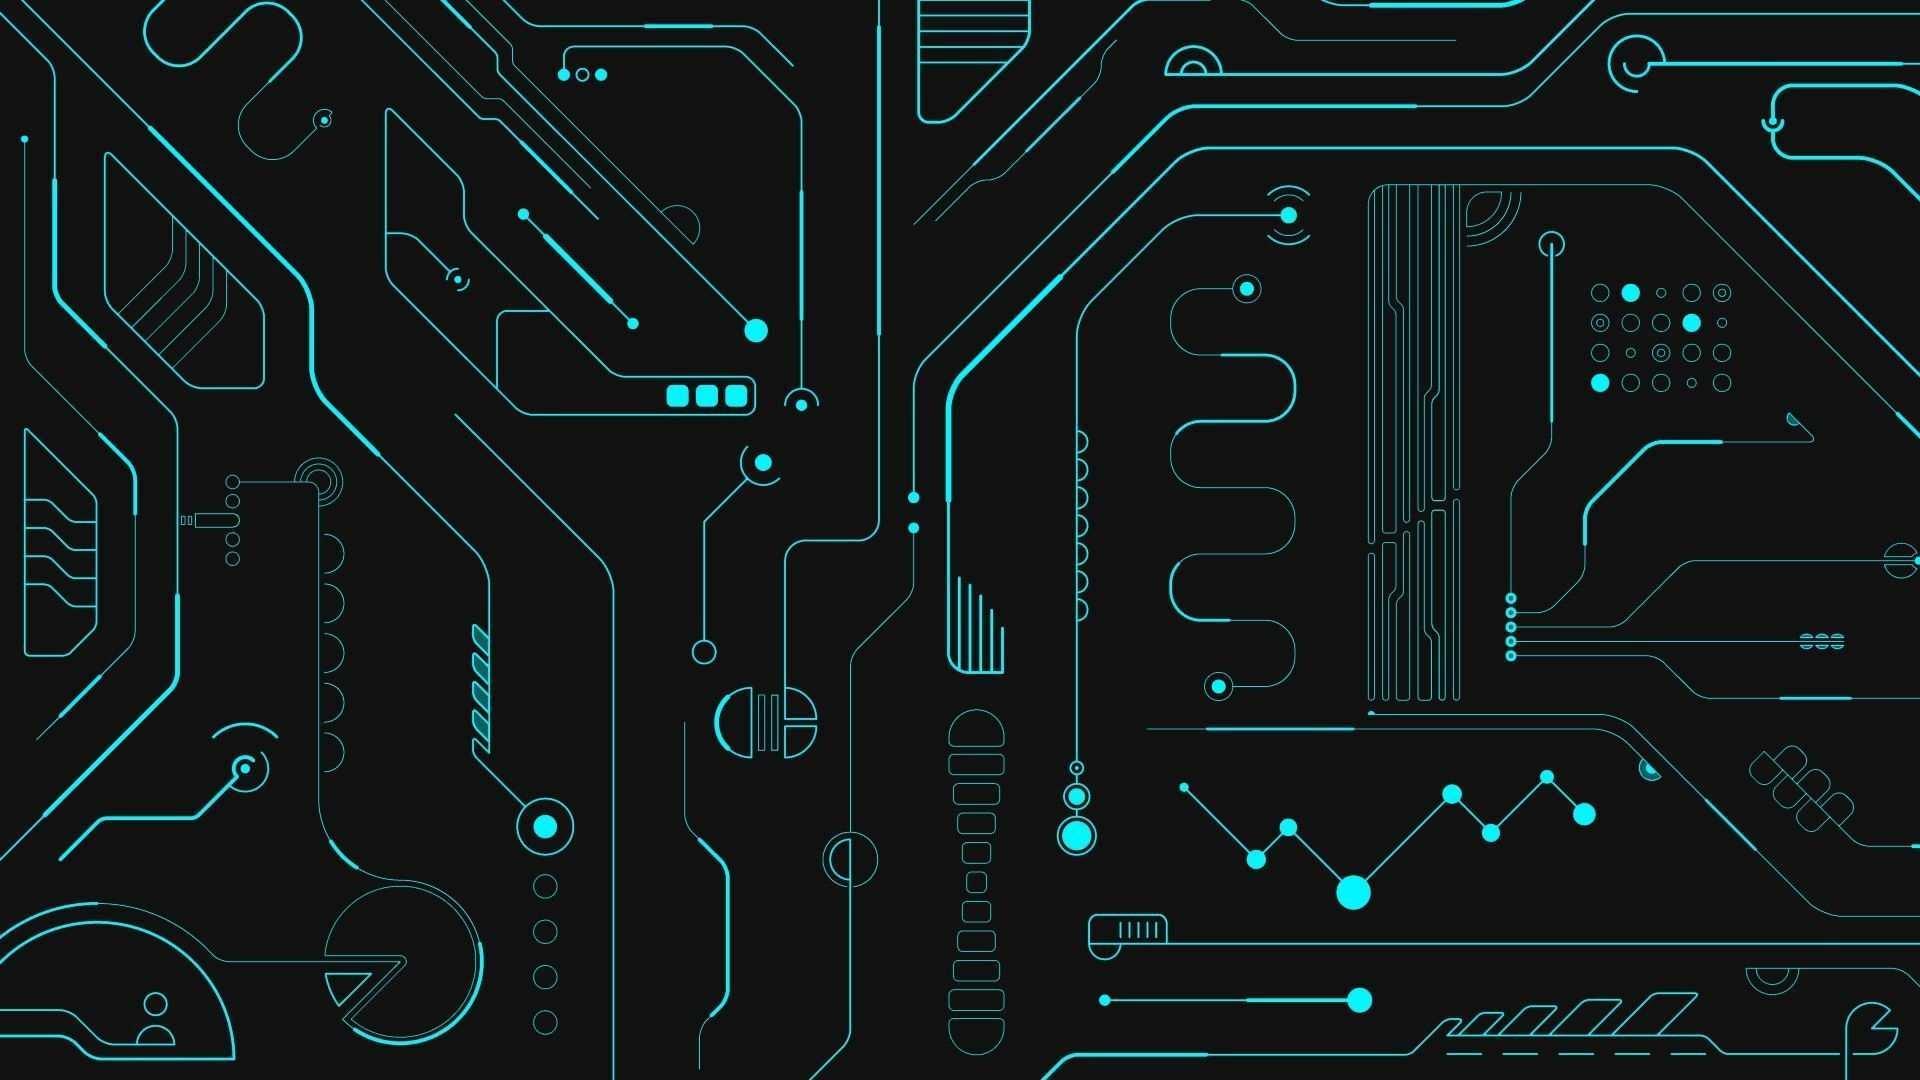 Circuit Wallpaper 1 Jpg 1920 1080 Background Design Circuit Design Background